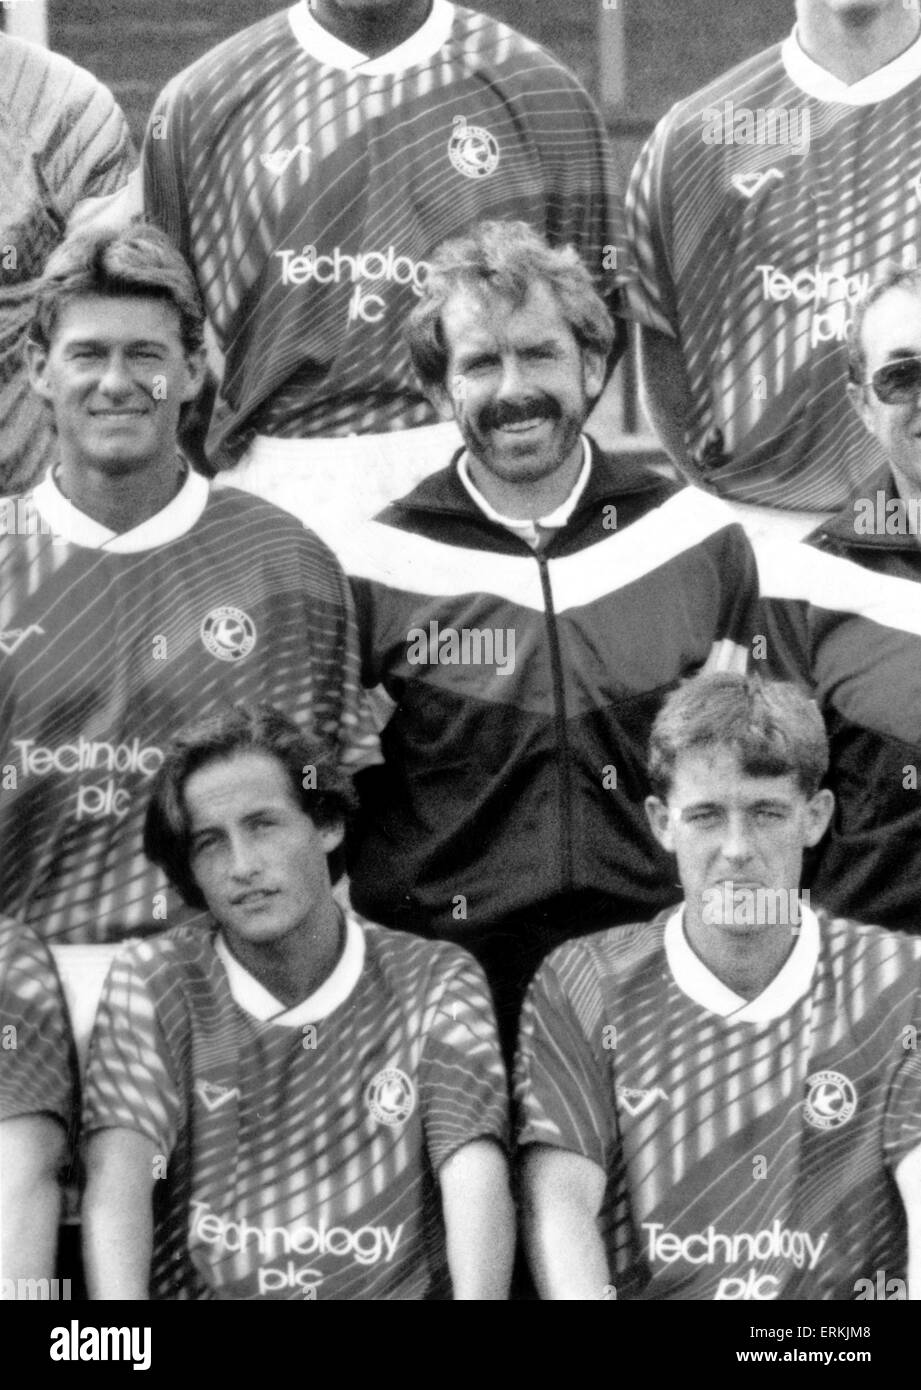 Tony Grealish. 16th Ausgust 1990. - Stock Image